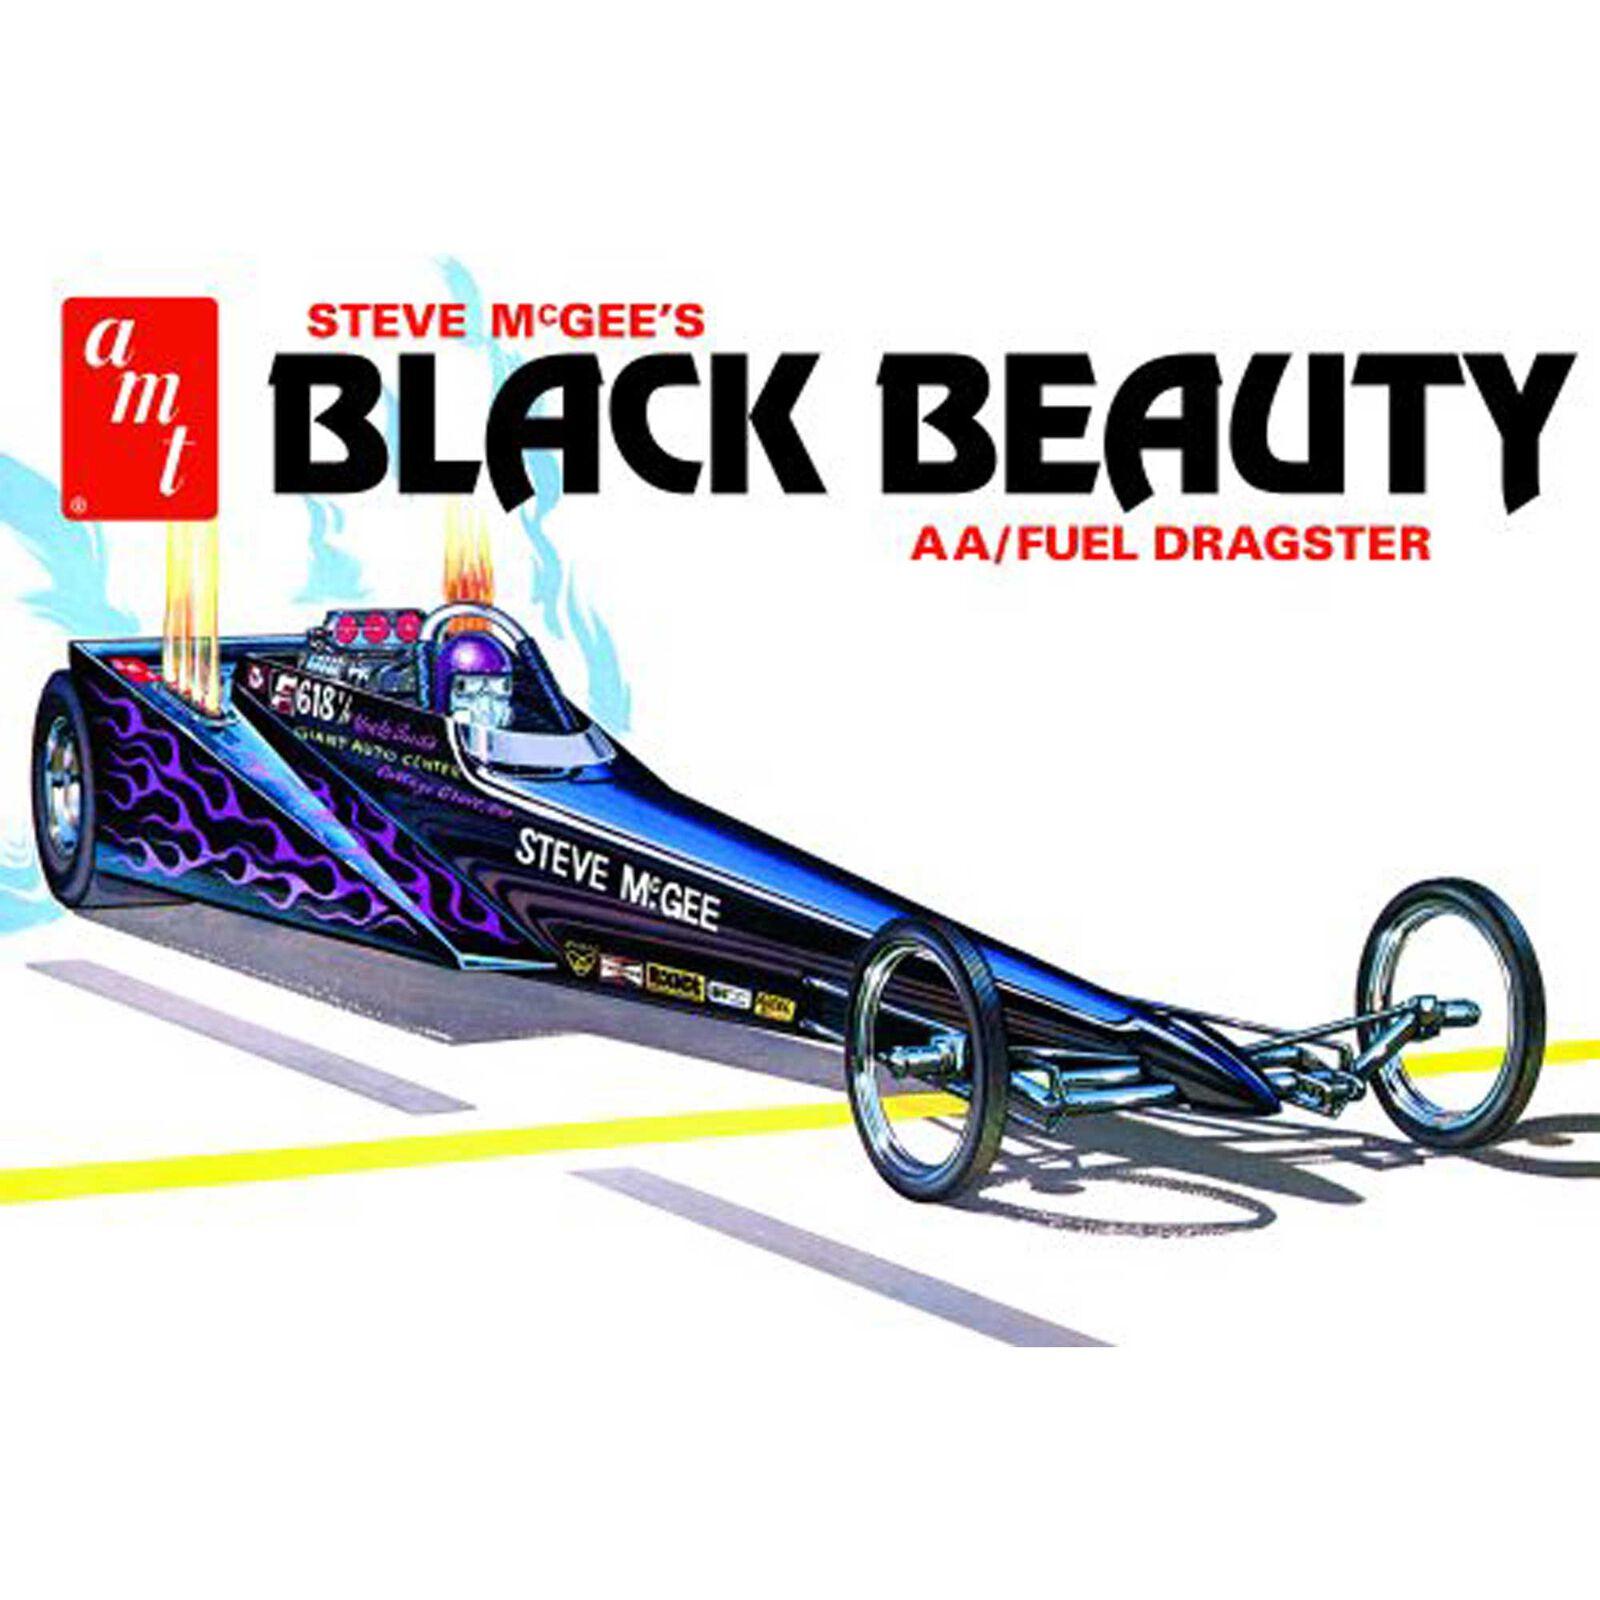 1/25 Steve McGee Black Beauty Wedge Dragster